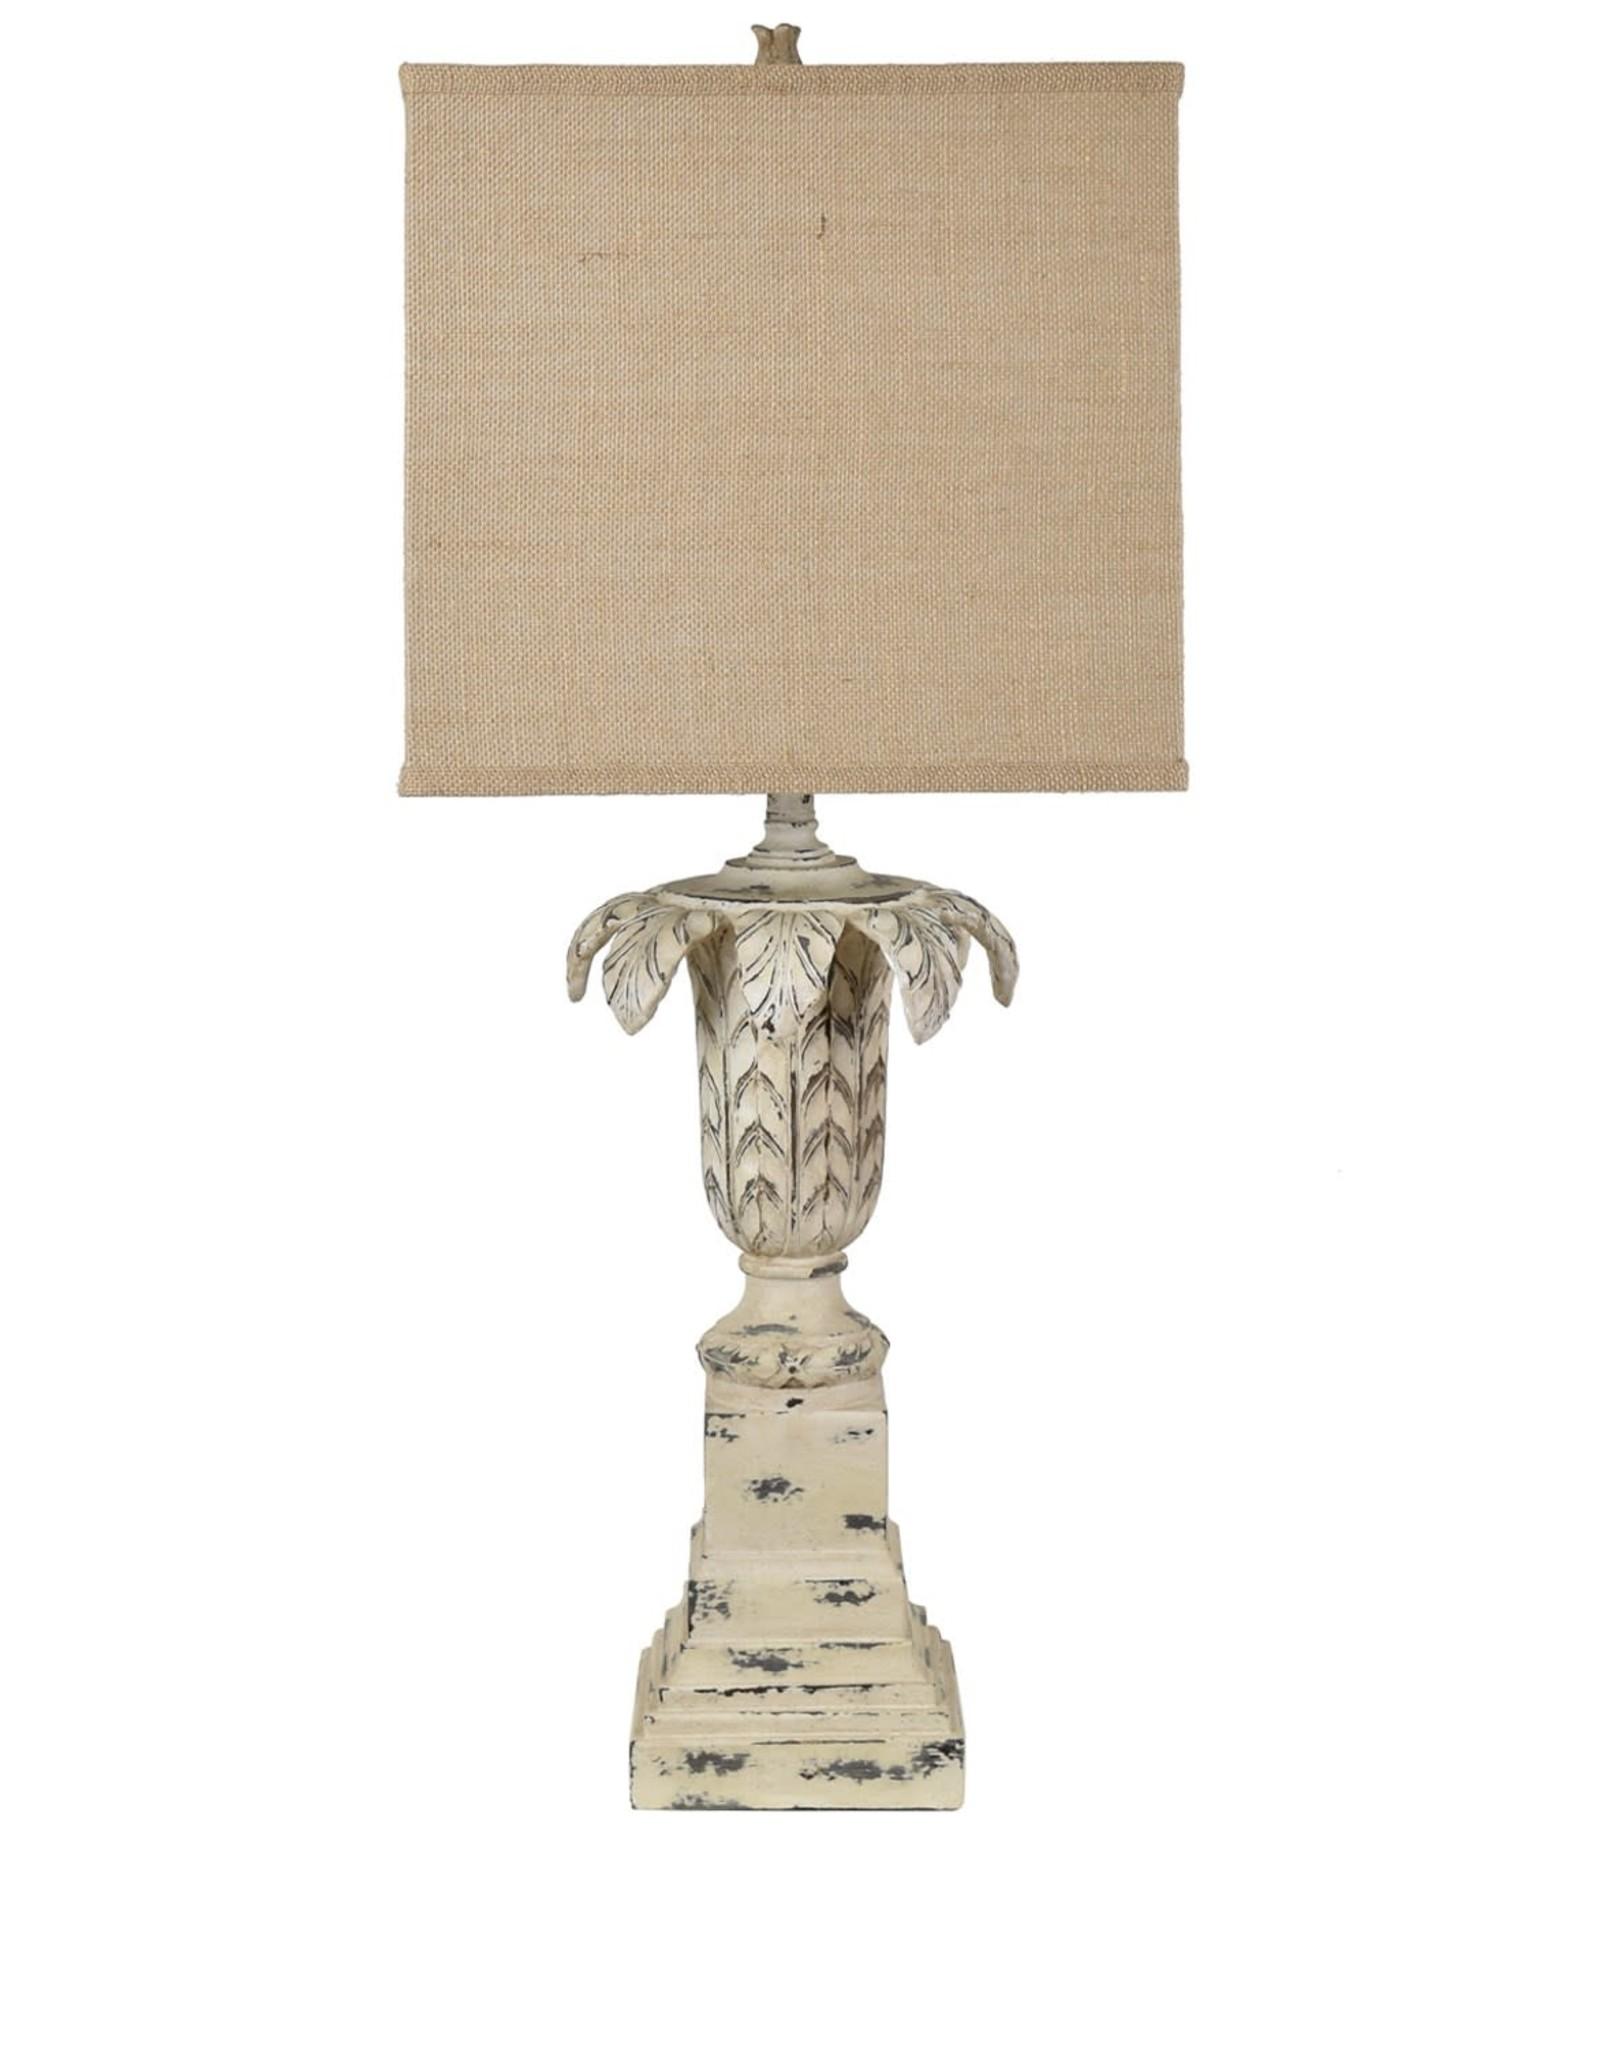 Crestview Ashlar Table Lamp w/ Burlap Shade